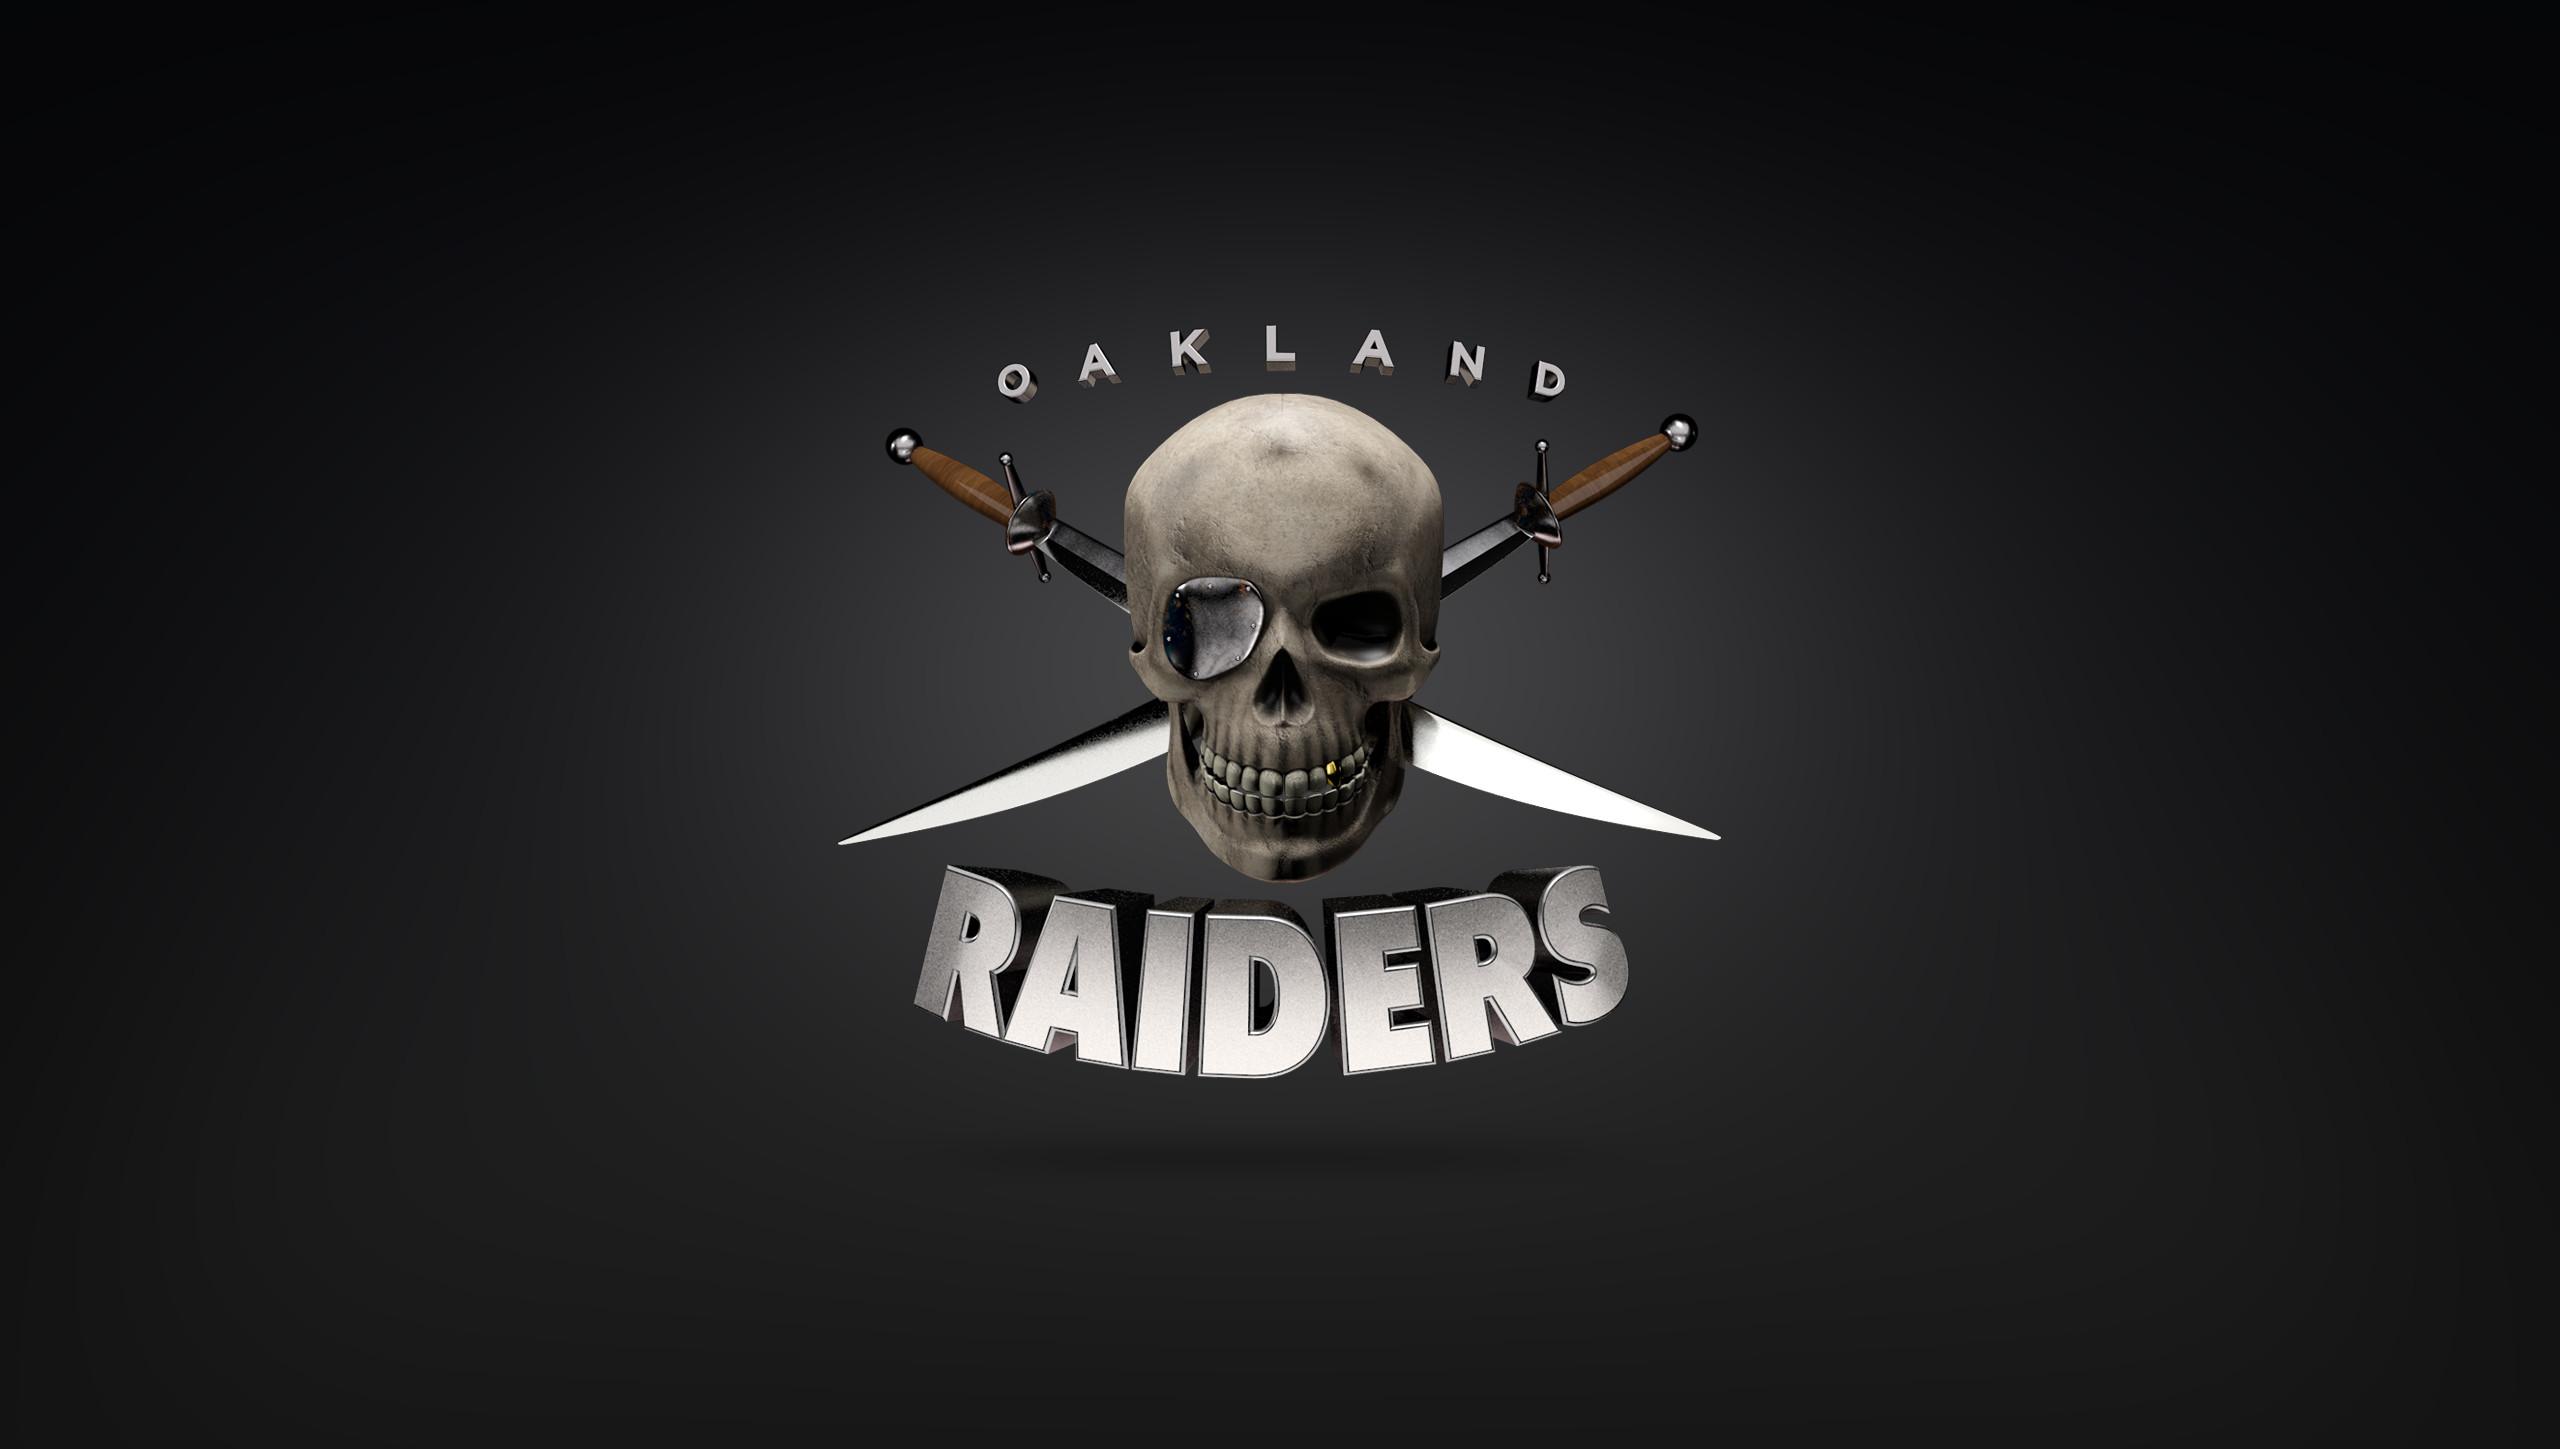 Raiders Wallpaper HD (76+ images)